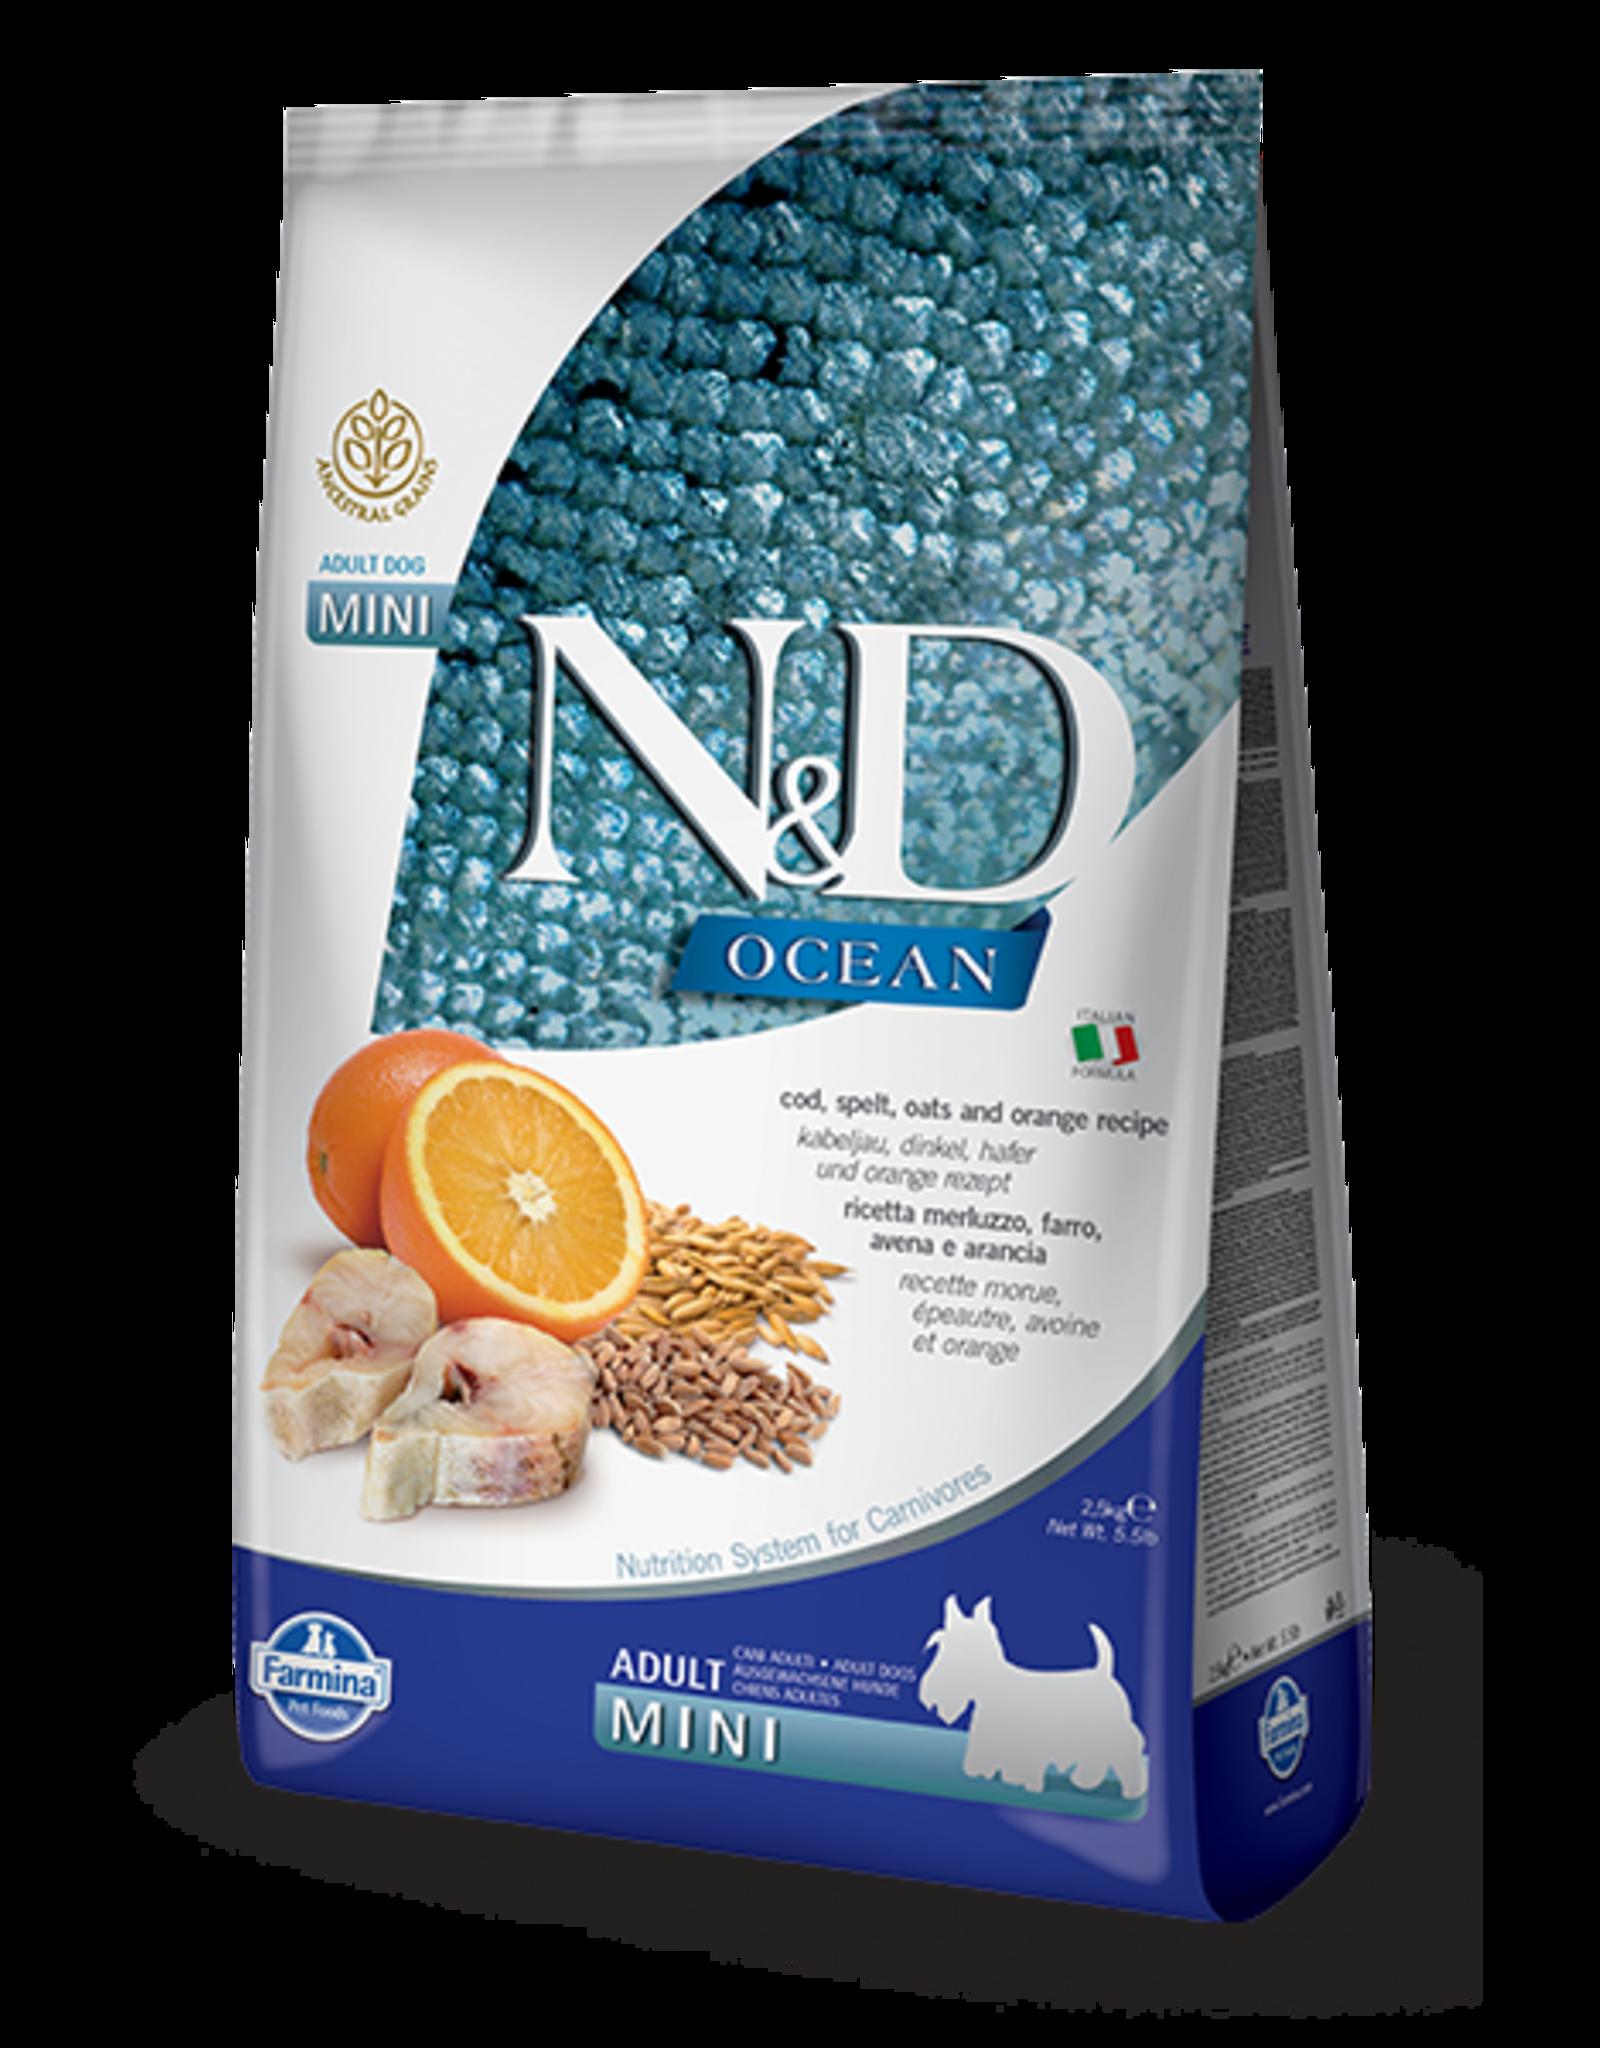 Farmina N&D Farmina N&D Ocean Cod, Spelt, Oats & Orange Recipe Adult Mini Dog Food 5.5lb